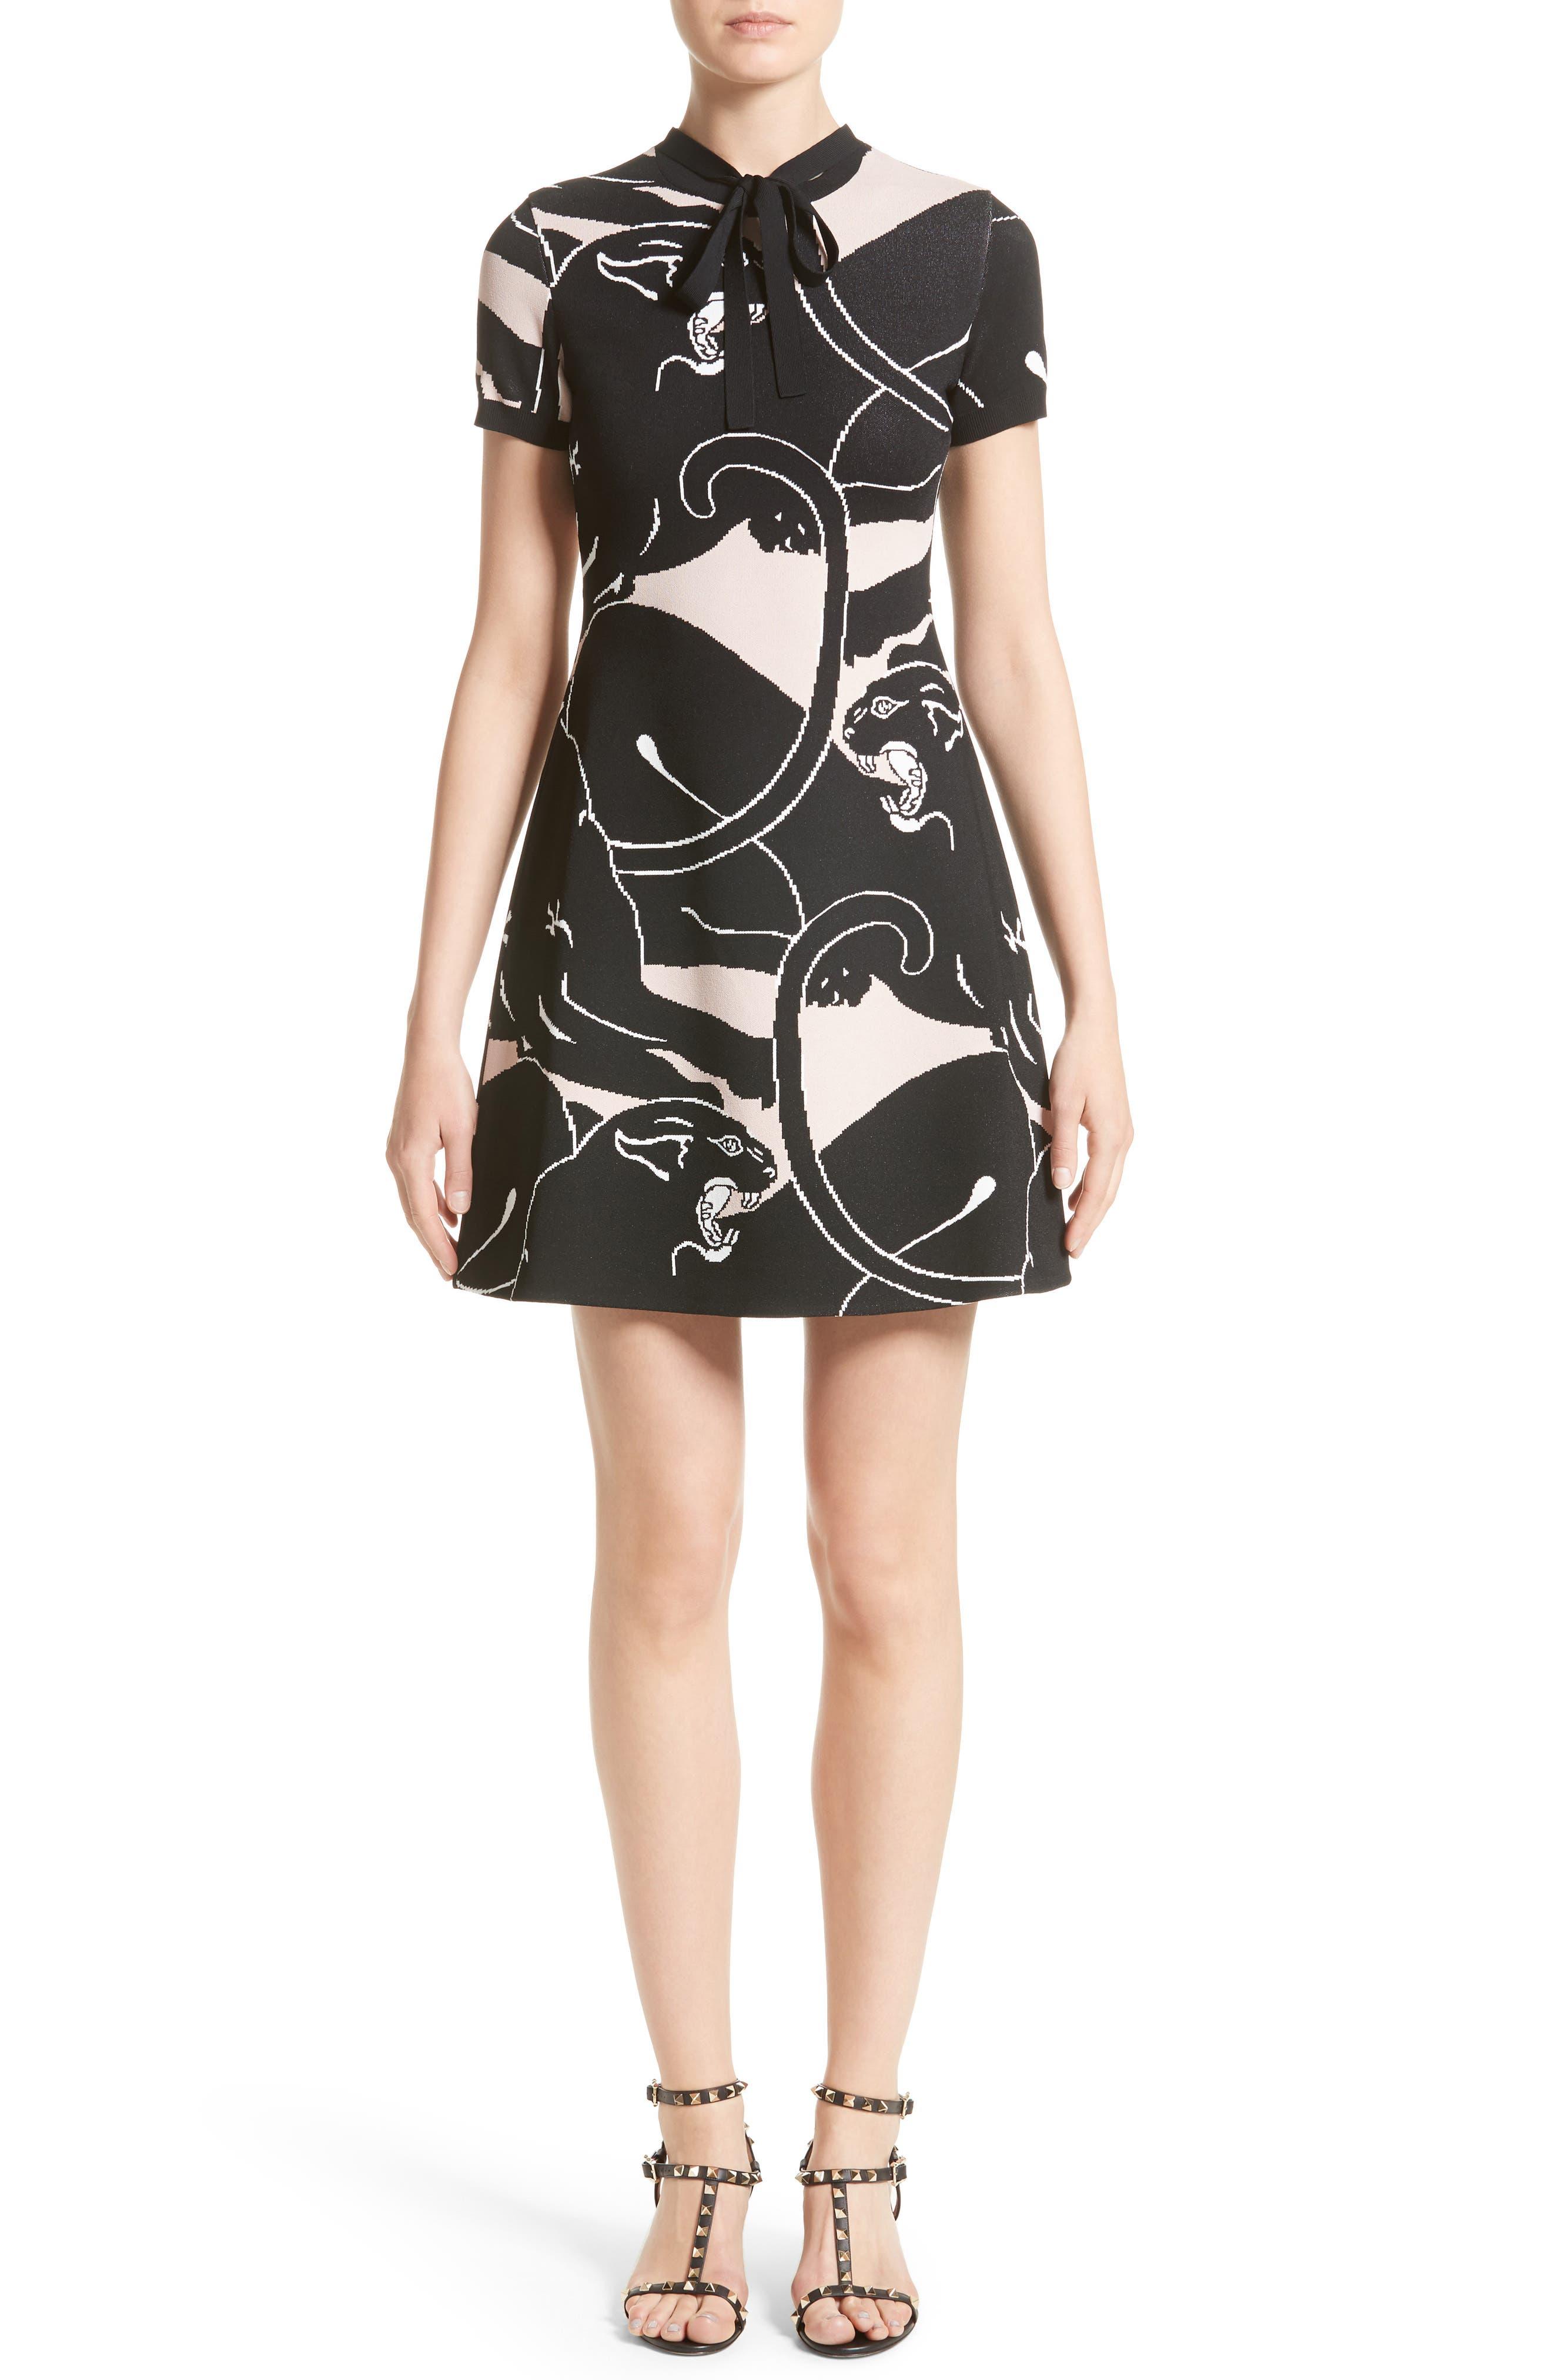 Jacquard Panther Print Dress,                             Main thumbnail 1, color,                             001